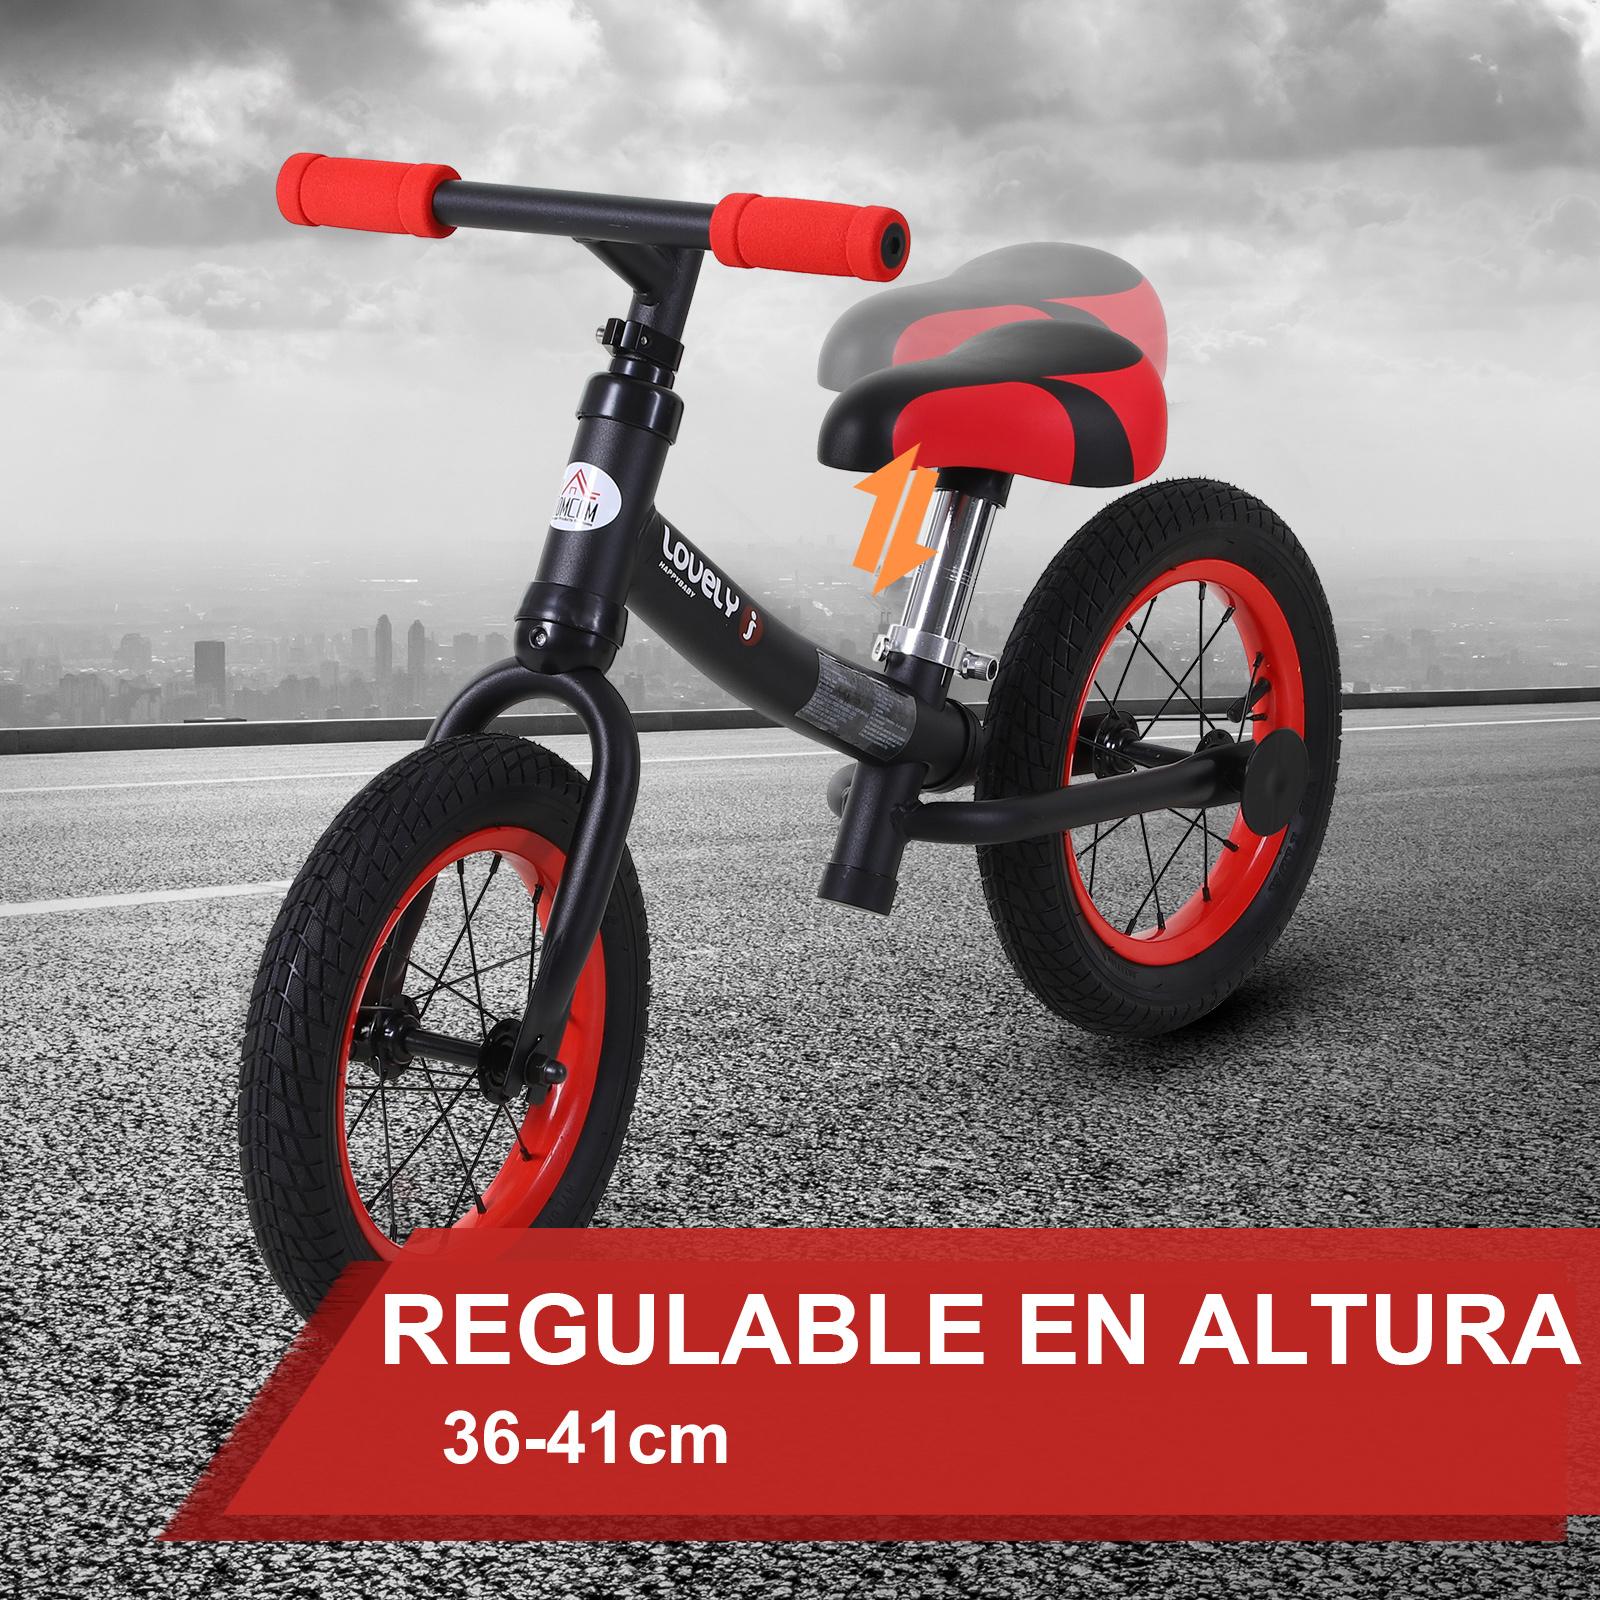 Bicicleta-sin-Pedales-de-Altura-de-Asiento-Regulable-31-45cm-2-5-Anos miniatura 5